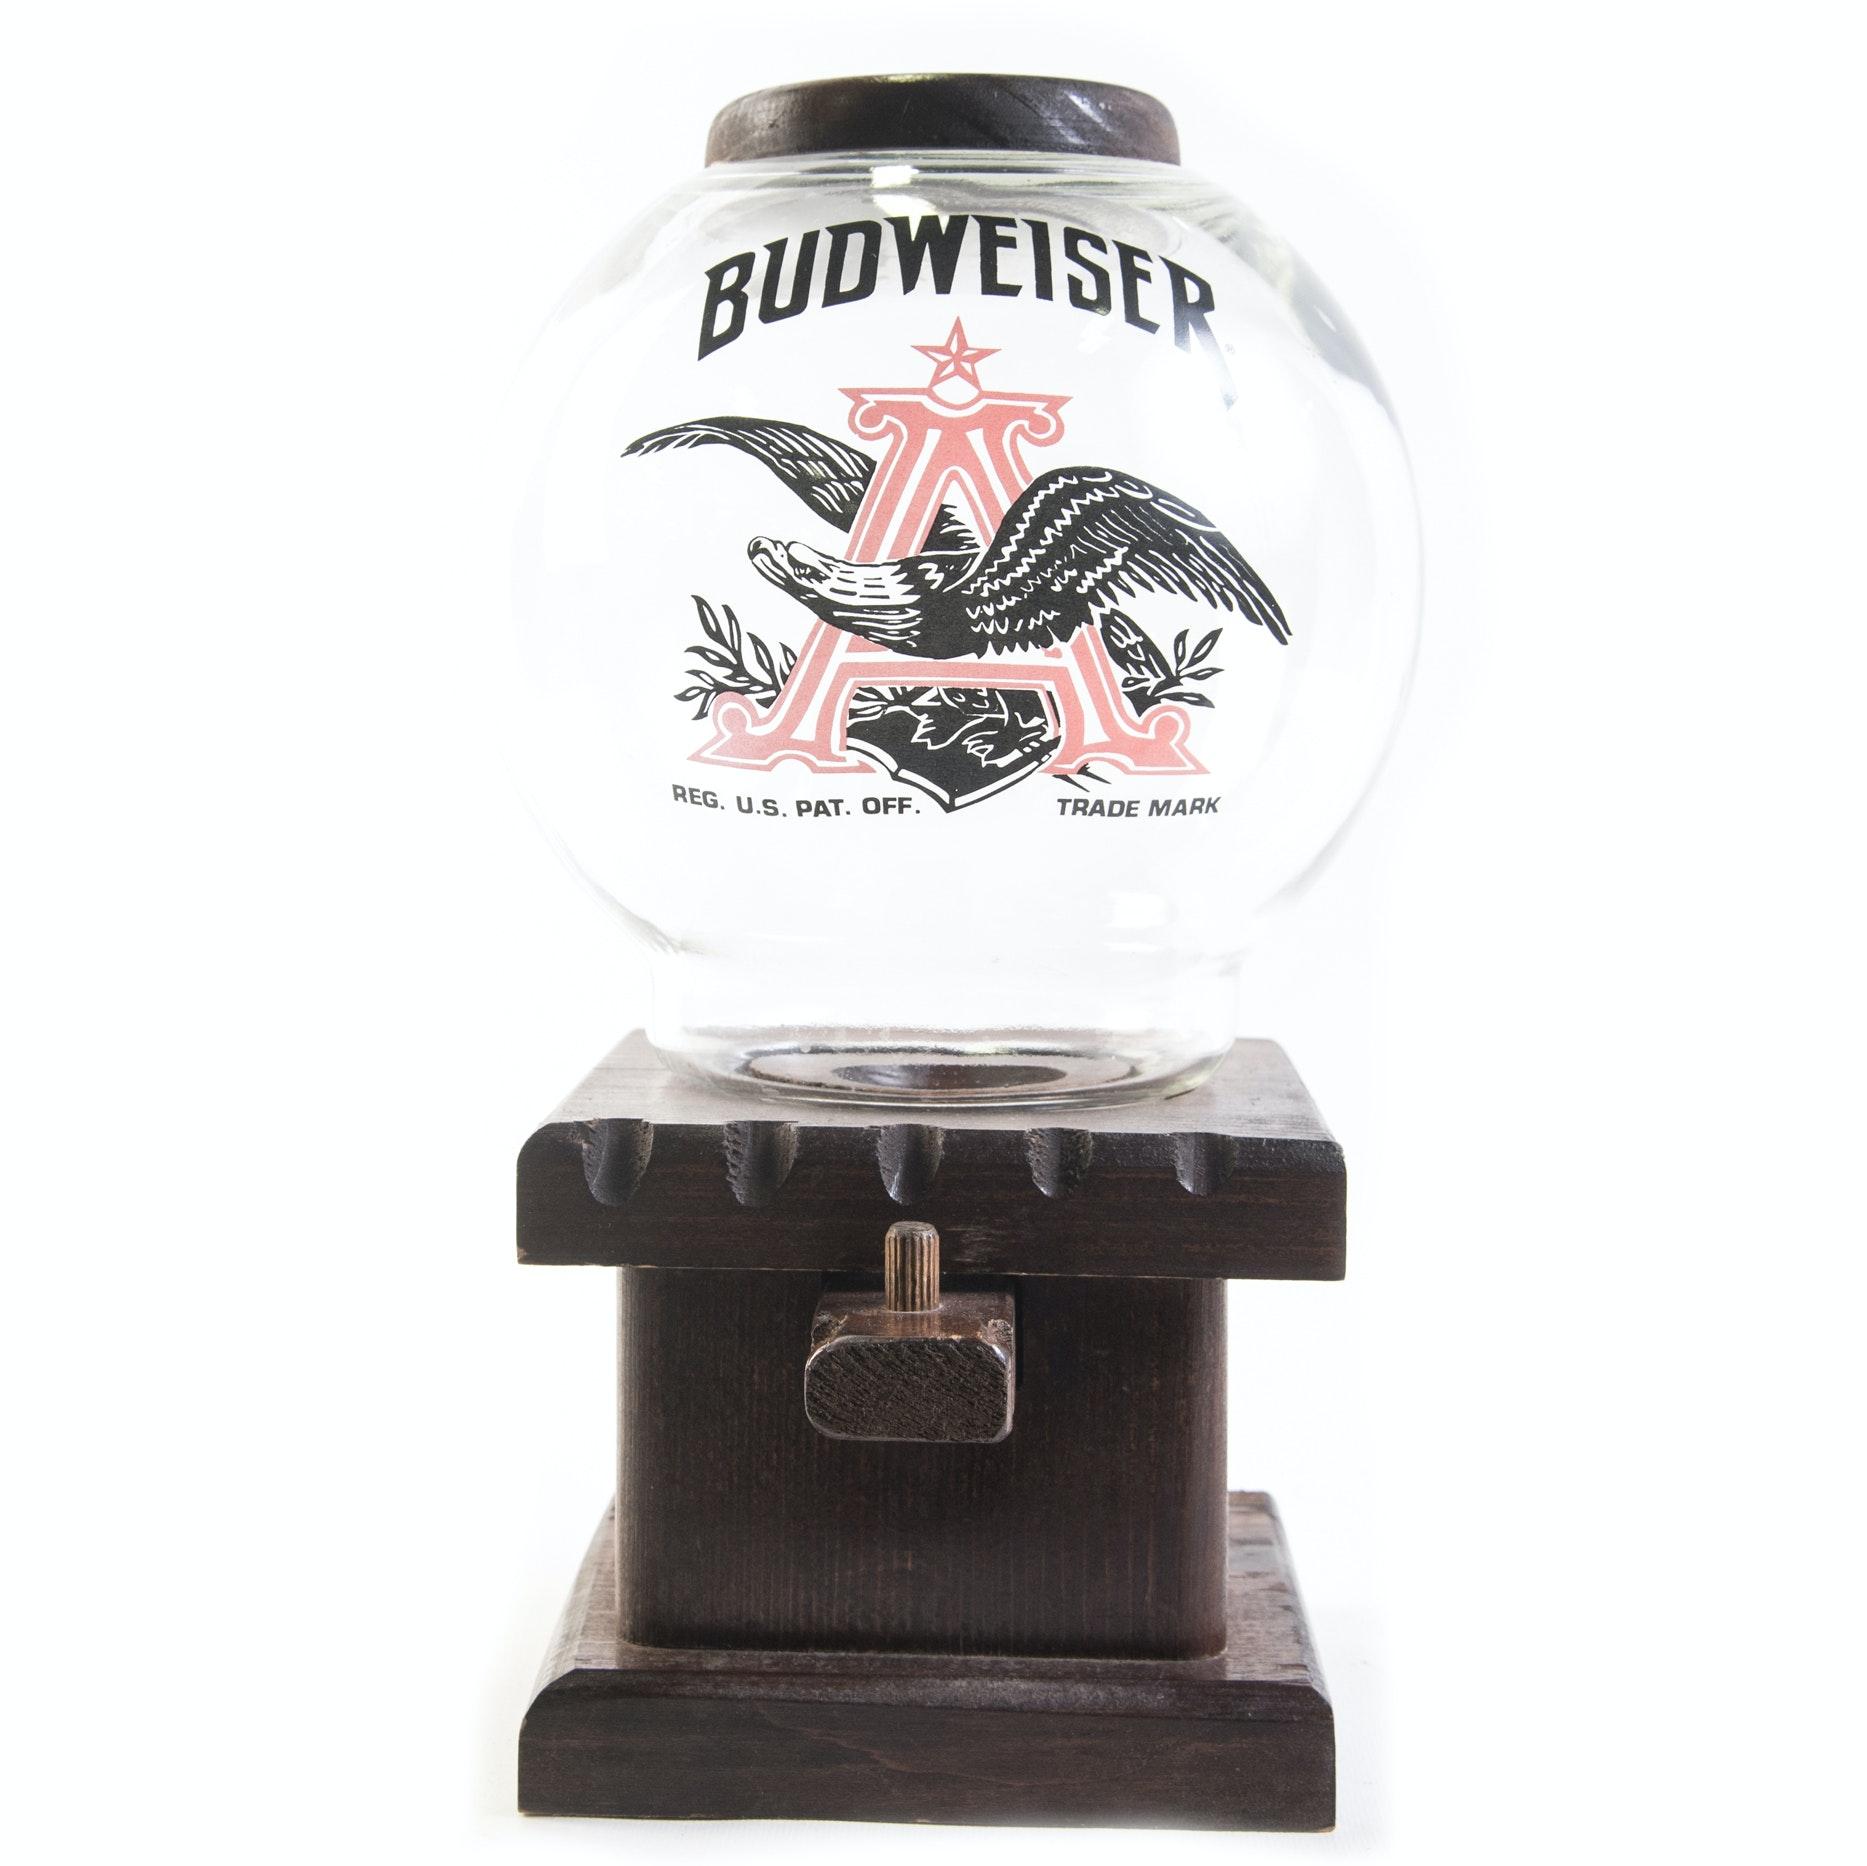 Vintage Budweiser Gumball Dispenser